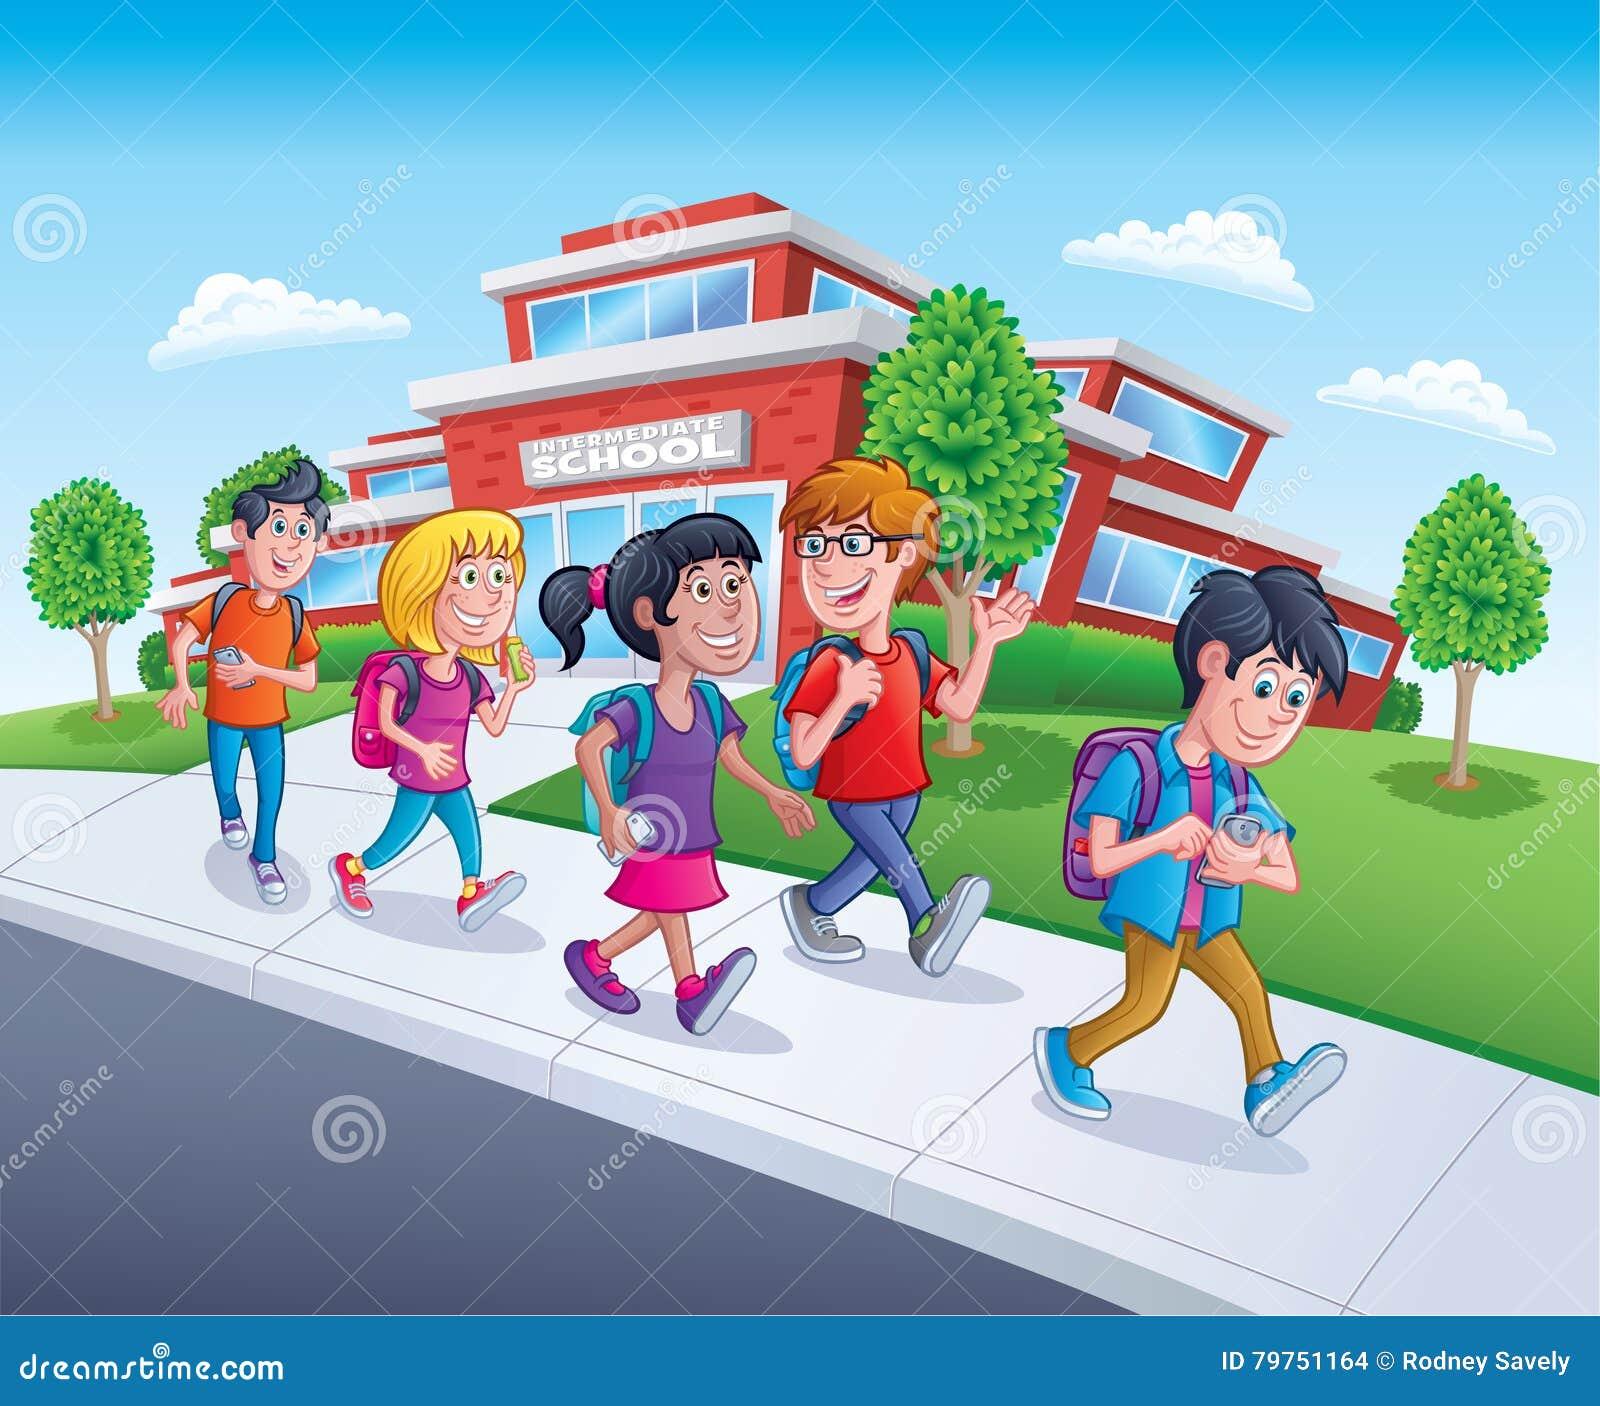 Adolescents Cartoons, Illustrations & Vector Stock Images